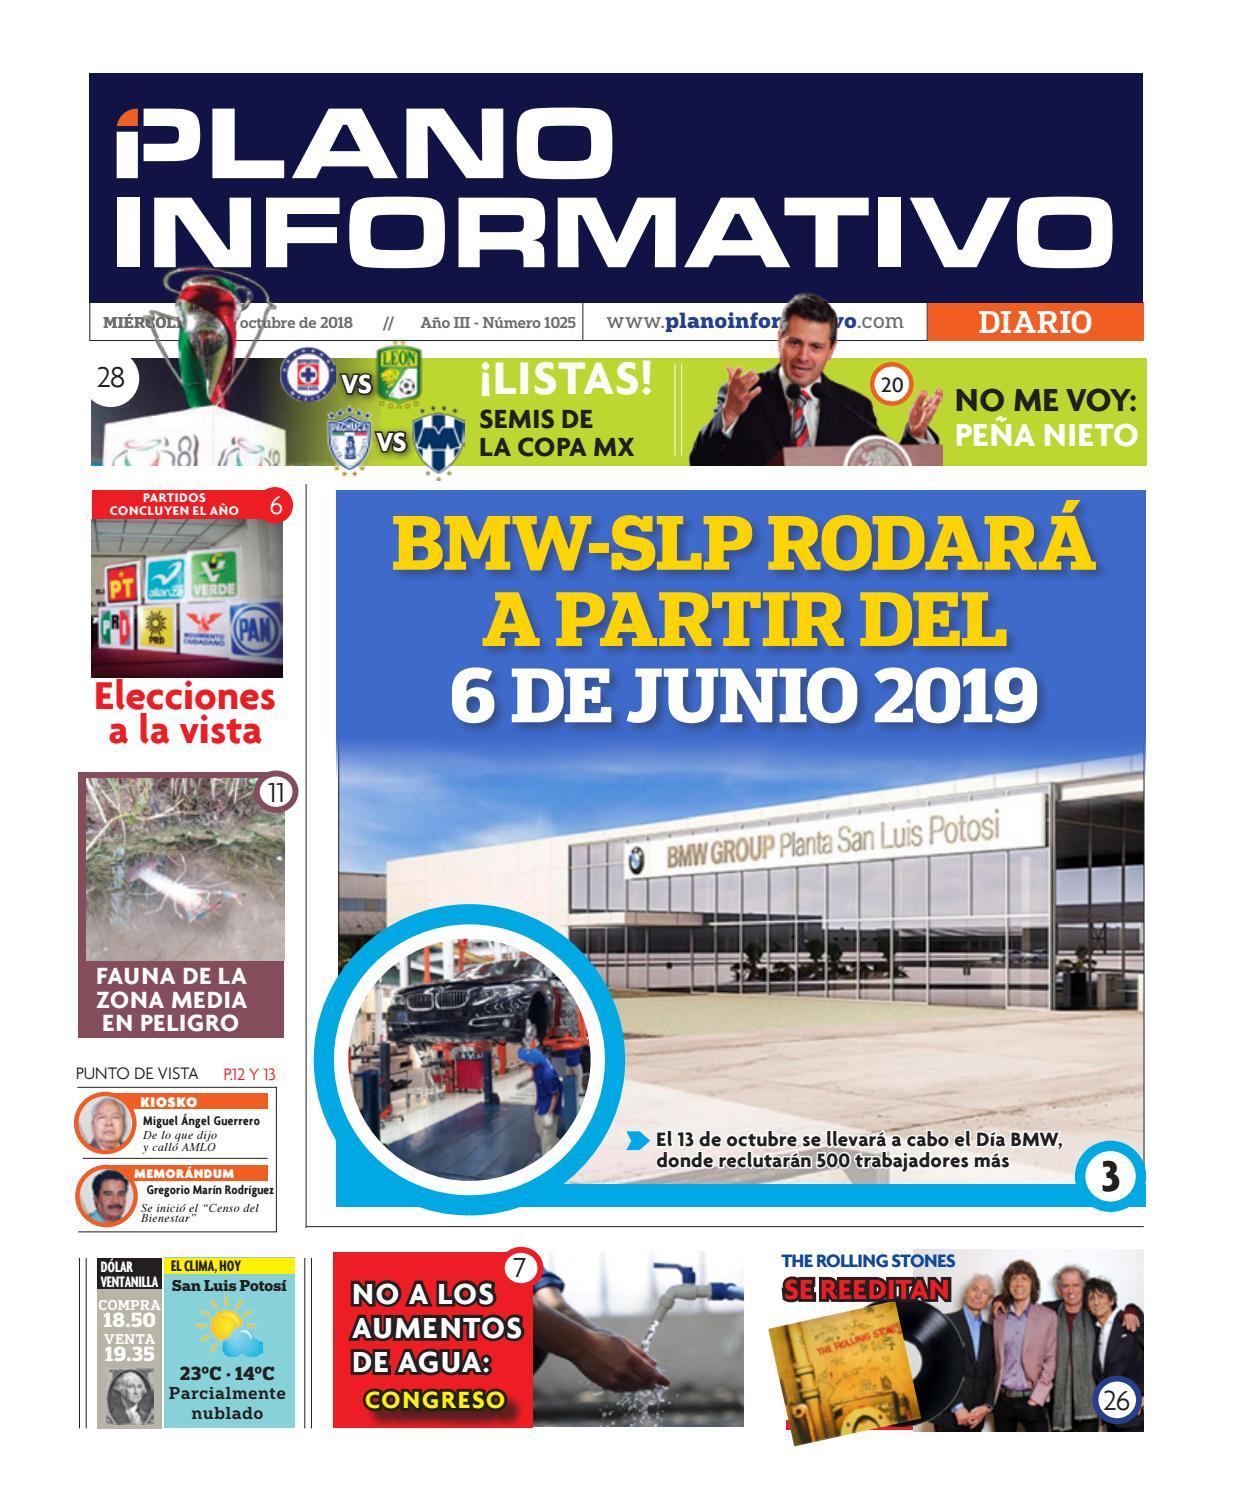 Plano Informativo Impreso Año 3 No. 1025 by Plano Informativo - issuu 3dc2fd33ae853